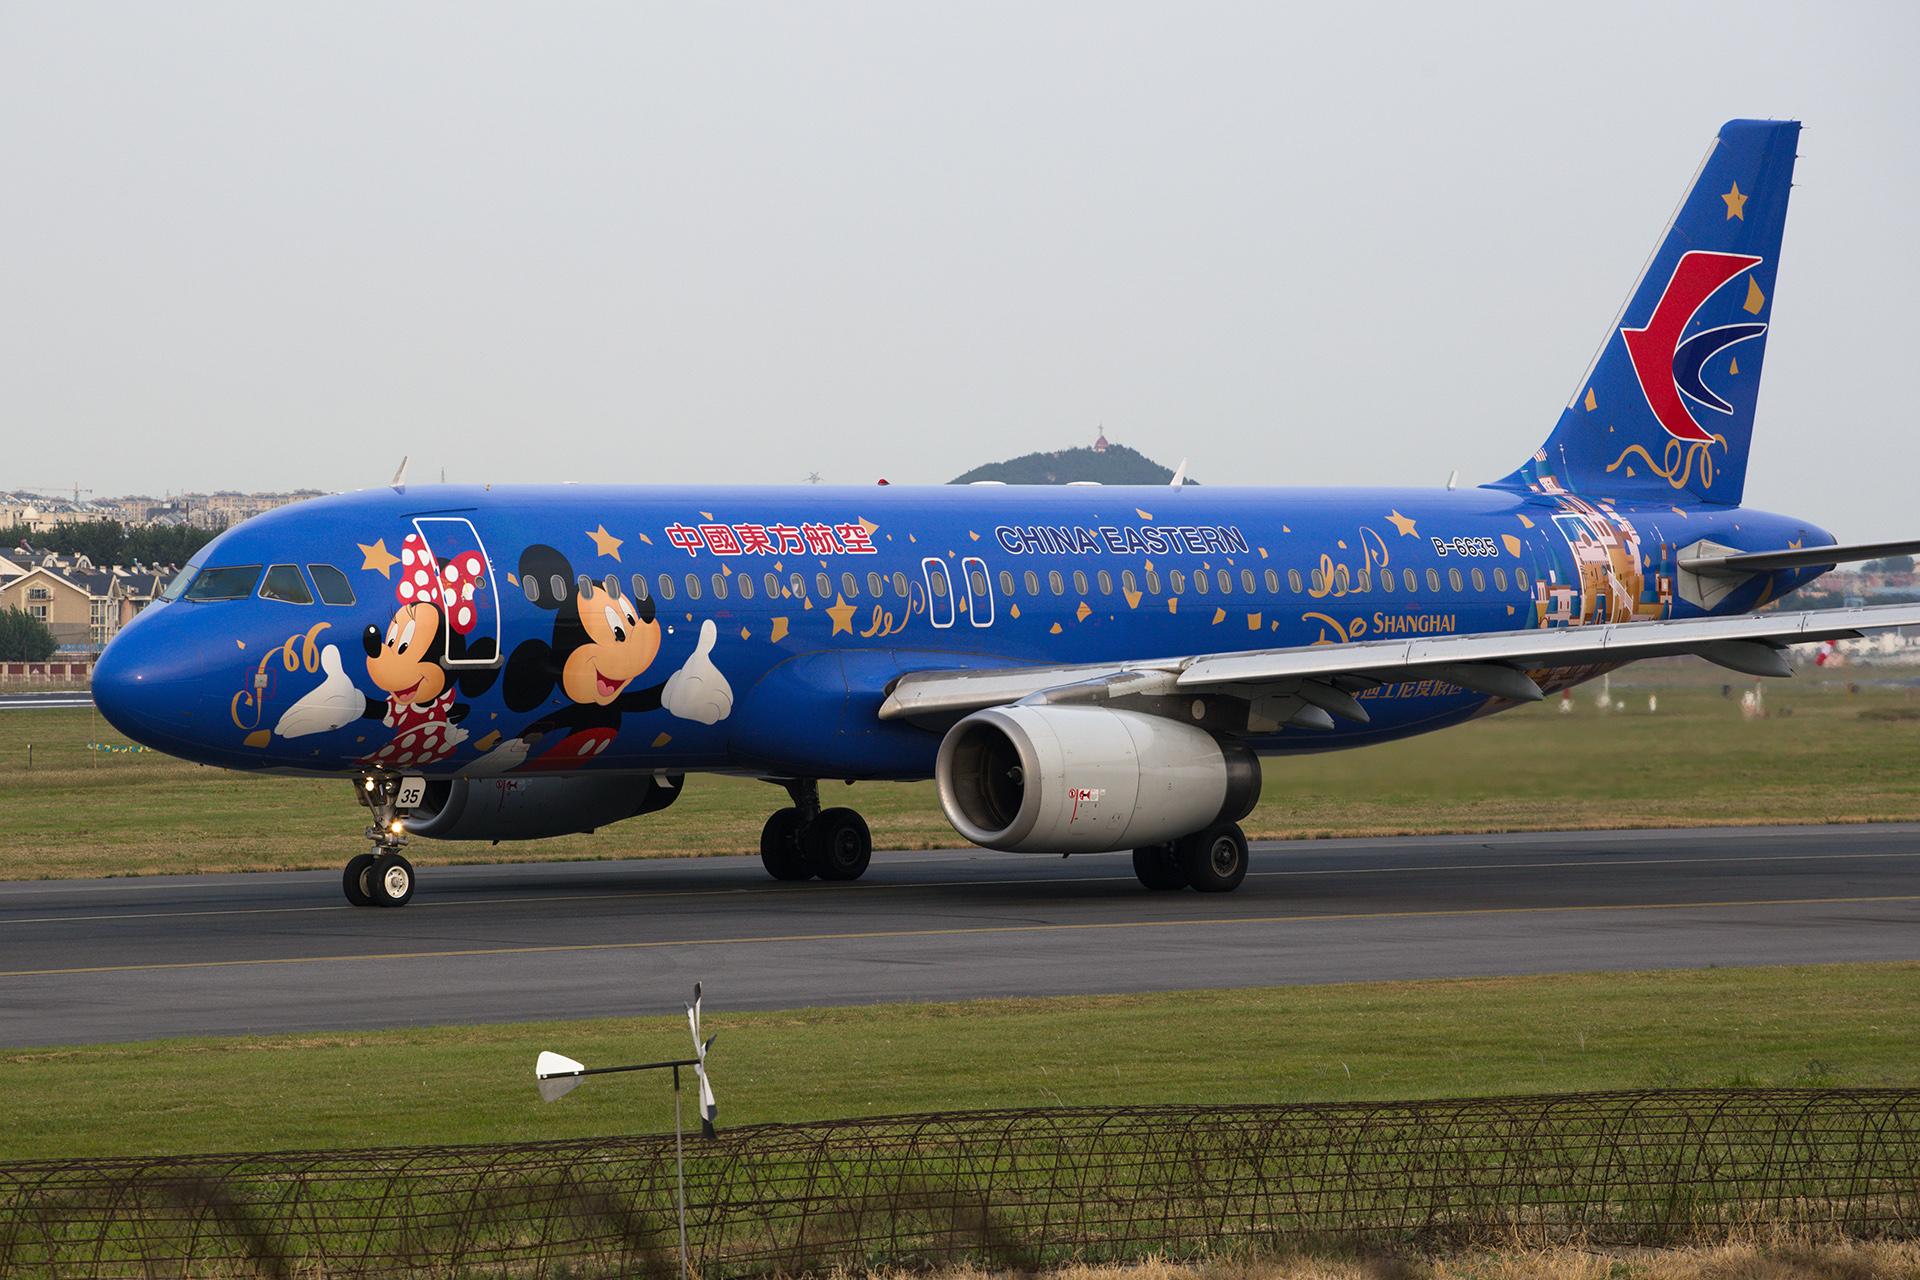 Re:[原创][PEK]。。。东航迪士尼A320 。。。 AIRBUS A320-200 B-6635 中国大连国际机场